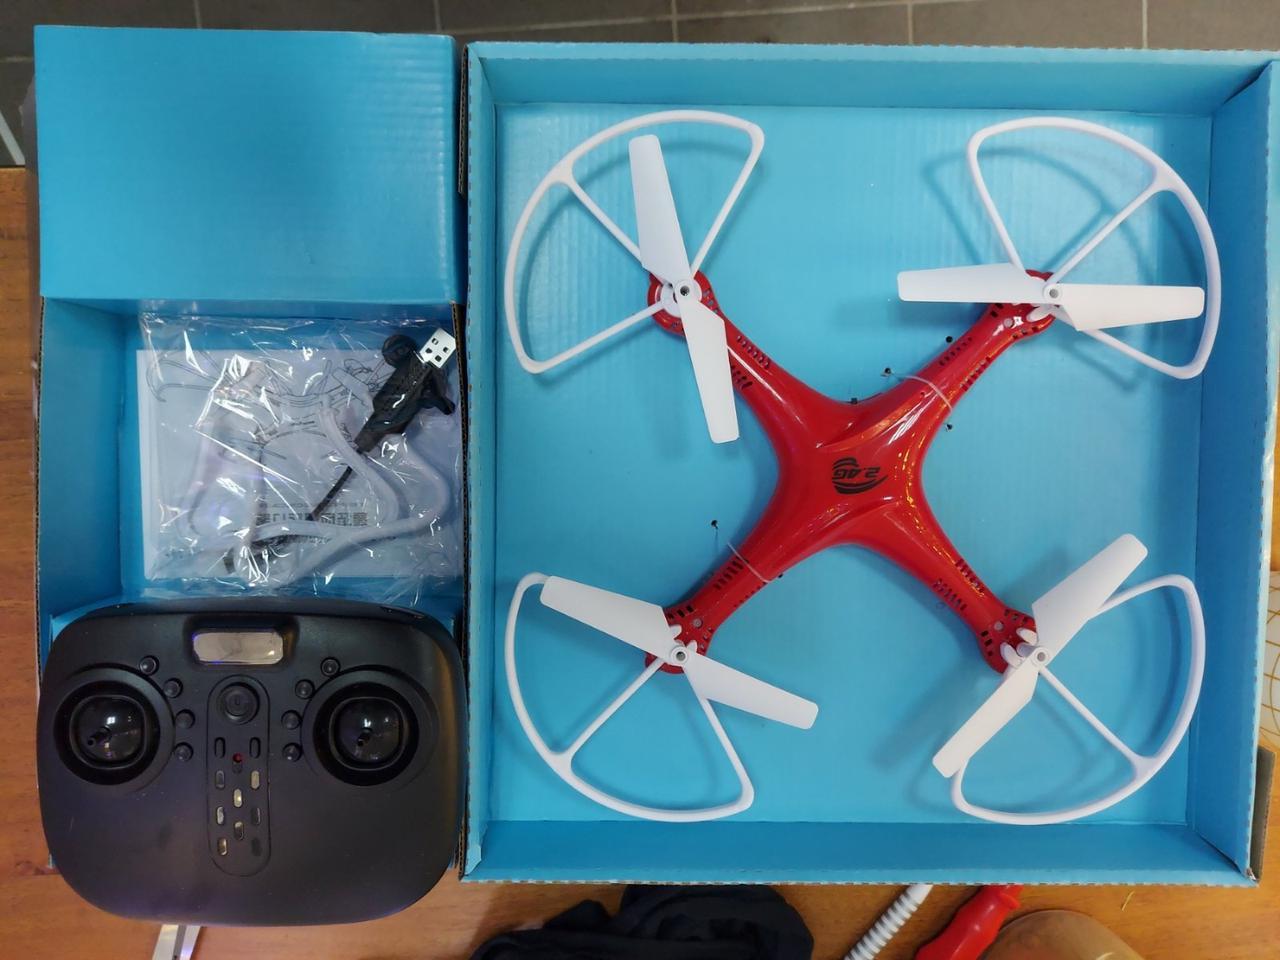 Квадрокоптер с пультом управления Drone 6 AXIS GYRO с Wi-Fi 2.4GHz. Без камеры